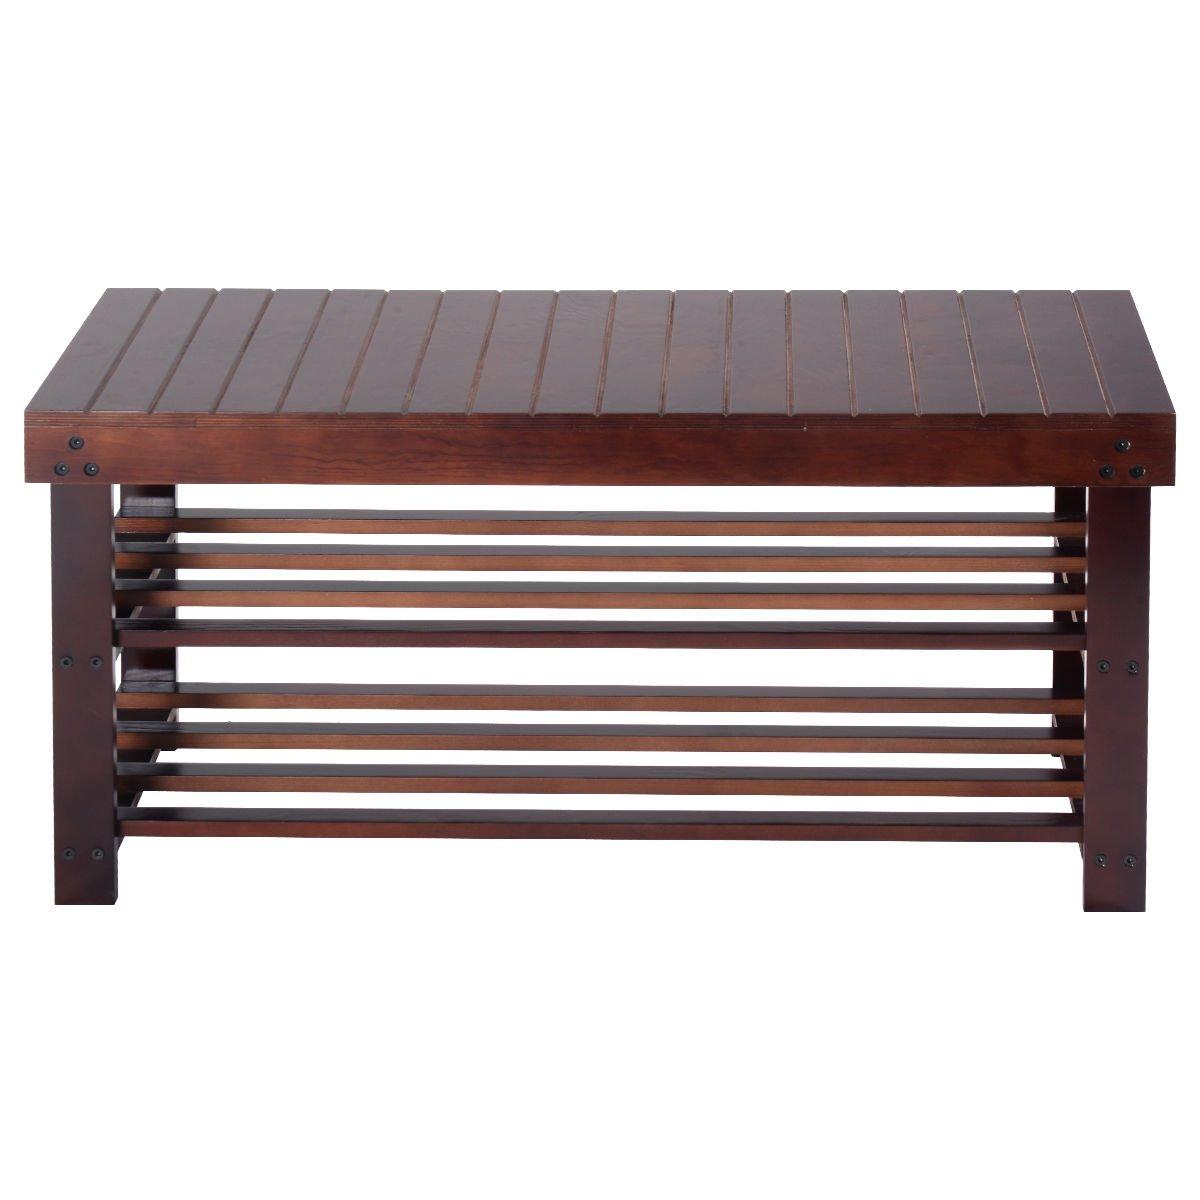 Global House Products GHP 36''x13''x17.9'' Espresso Pine Wood 2-Tier Entryway Slatted Shelf Shoe Rack Storage